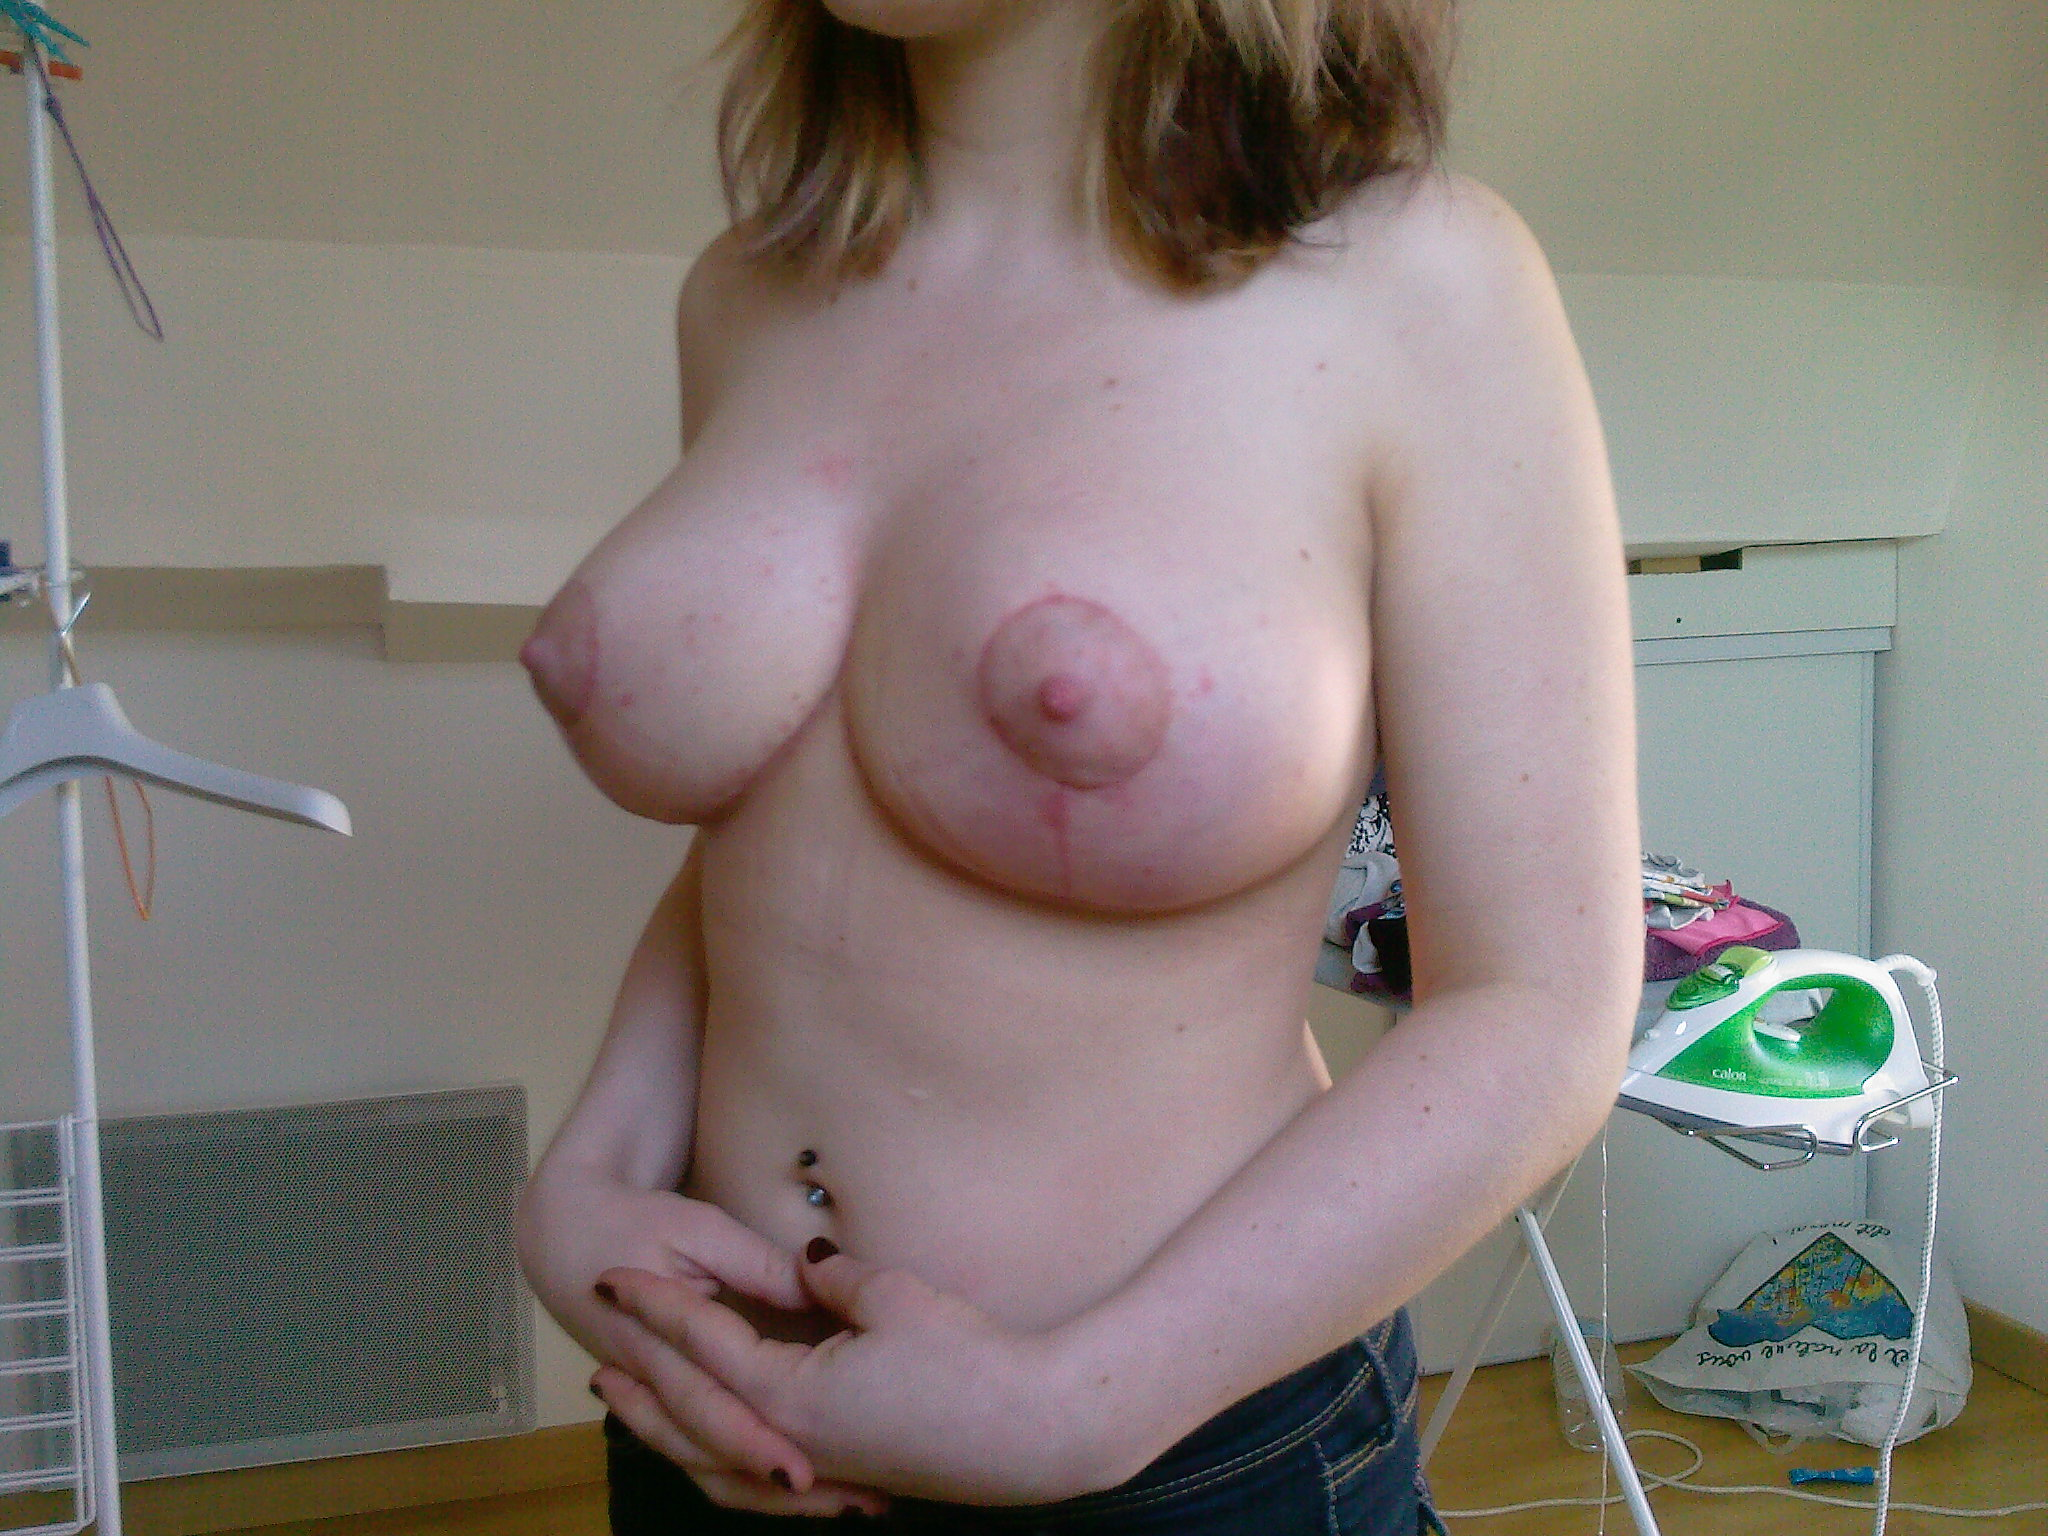 reduction-mammaire-25-4-gauche-big